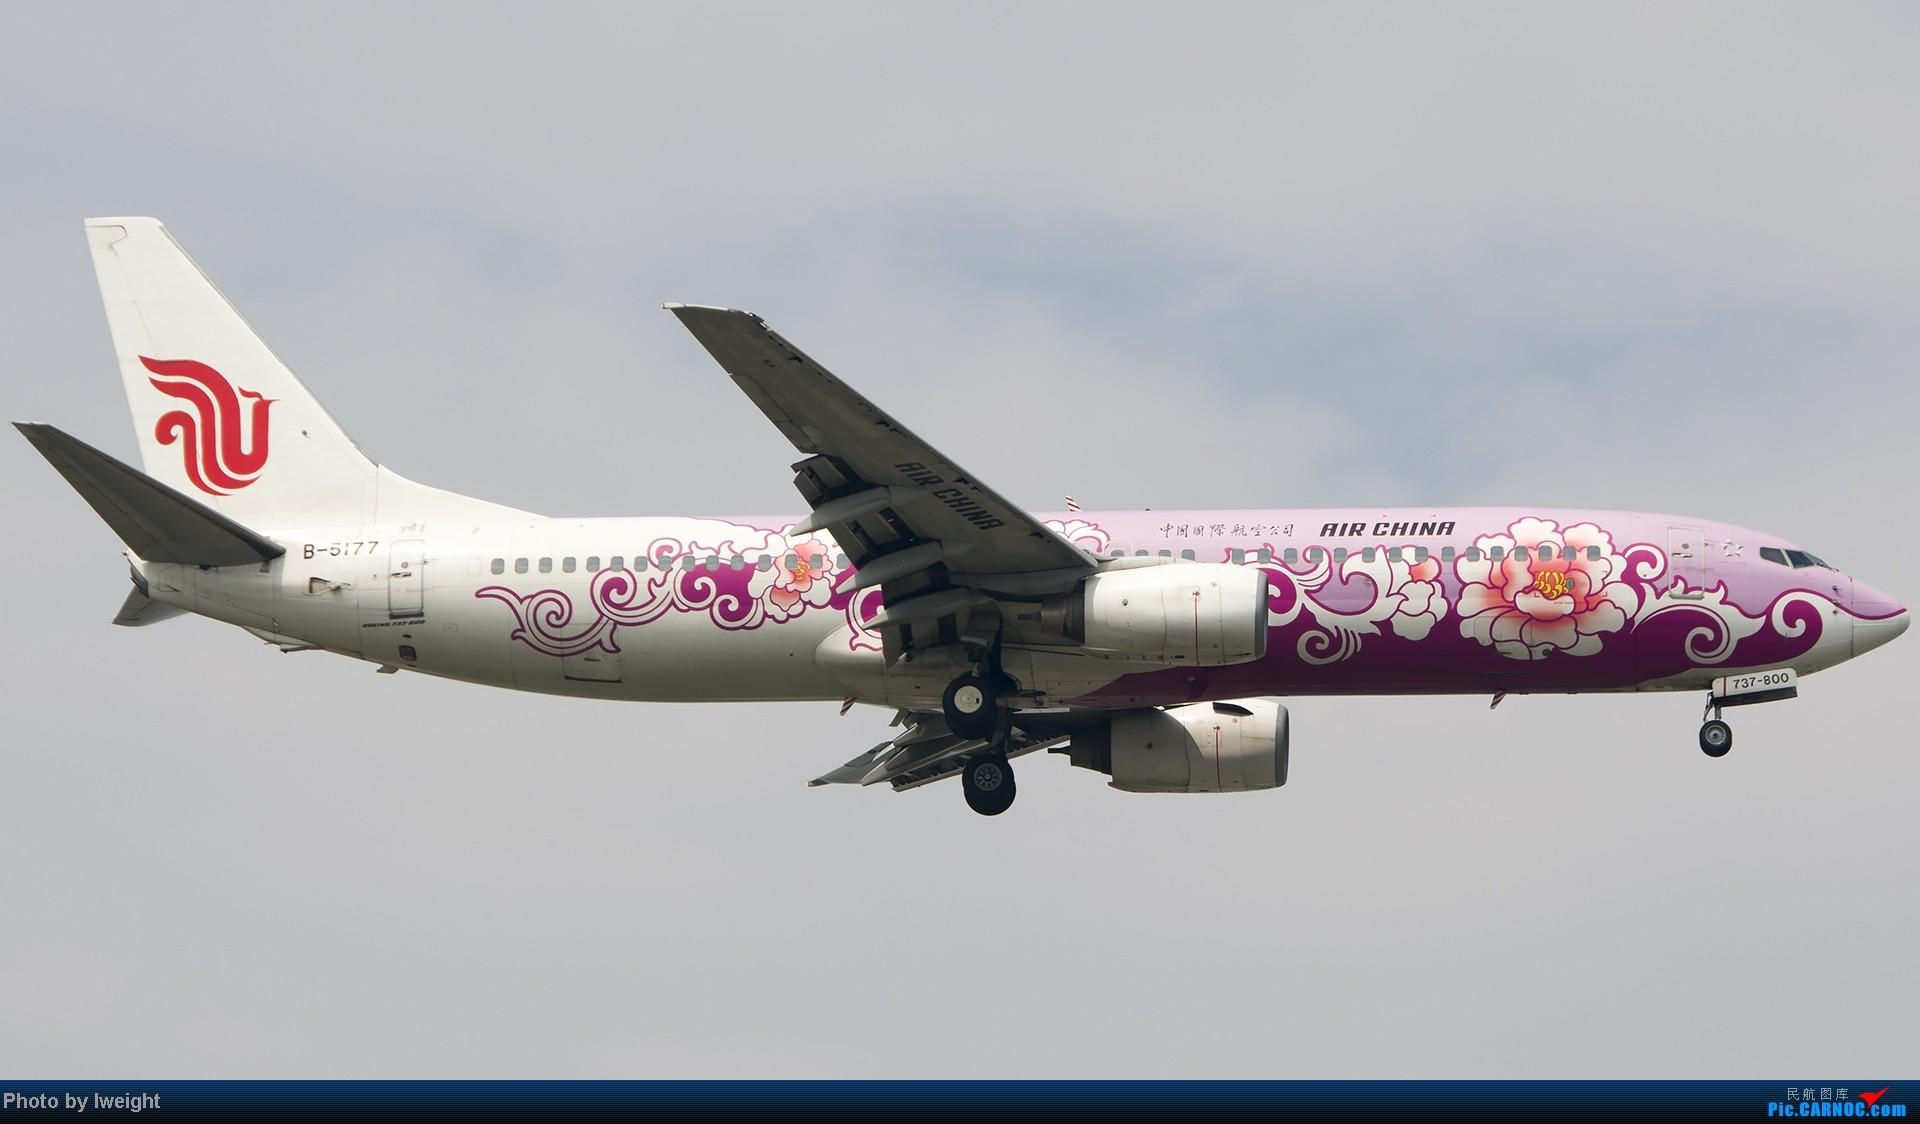 Re:[原创]休假无聊,跑道边来拍机玩(晚点的ZestAir、换装的B6100和刚交付的B2738等) BOEING 737-800 B-5177 中国北京首都机场